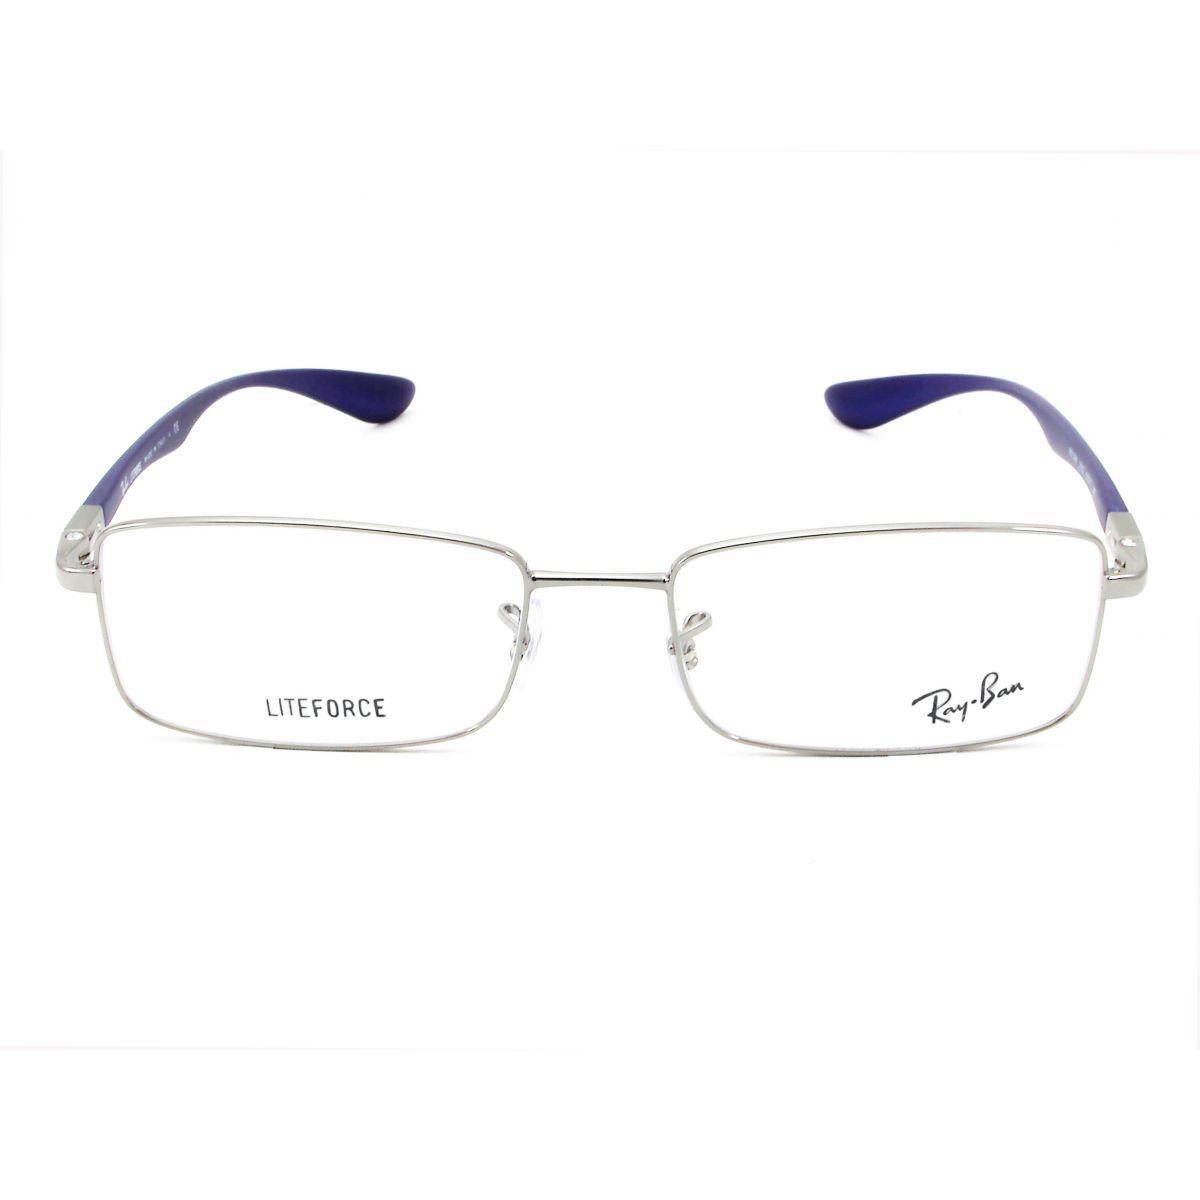 4b9380efdec52 Óculos De Grau Ray Ban RB6286 2502 Tam.54Ray Ban OriginalRay Ban de ...